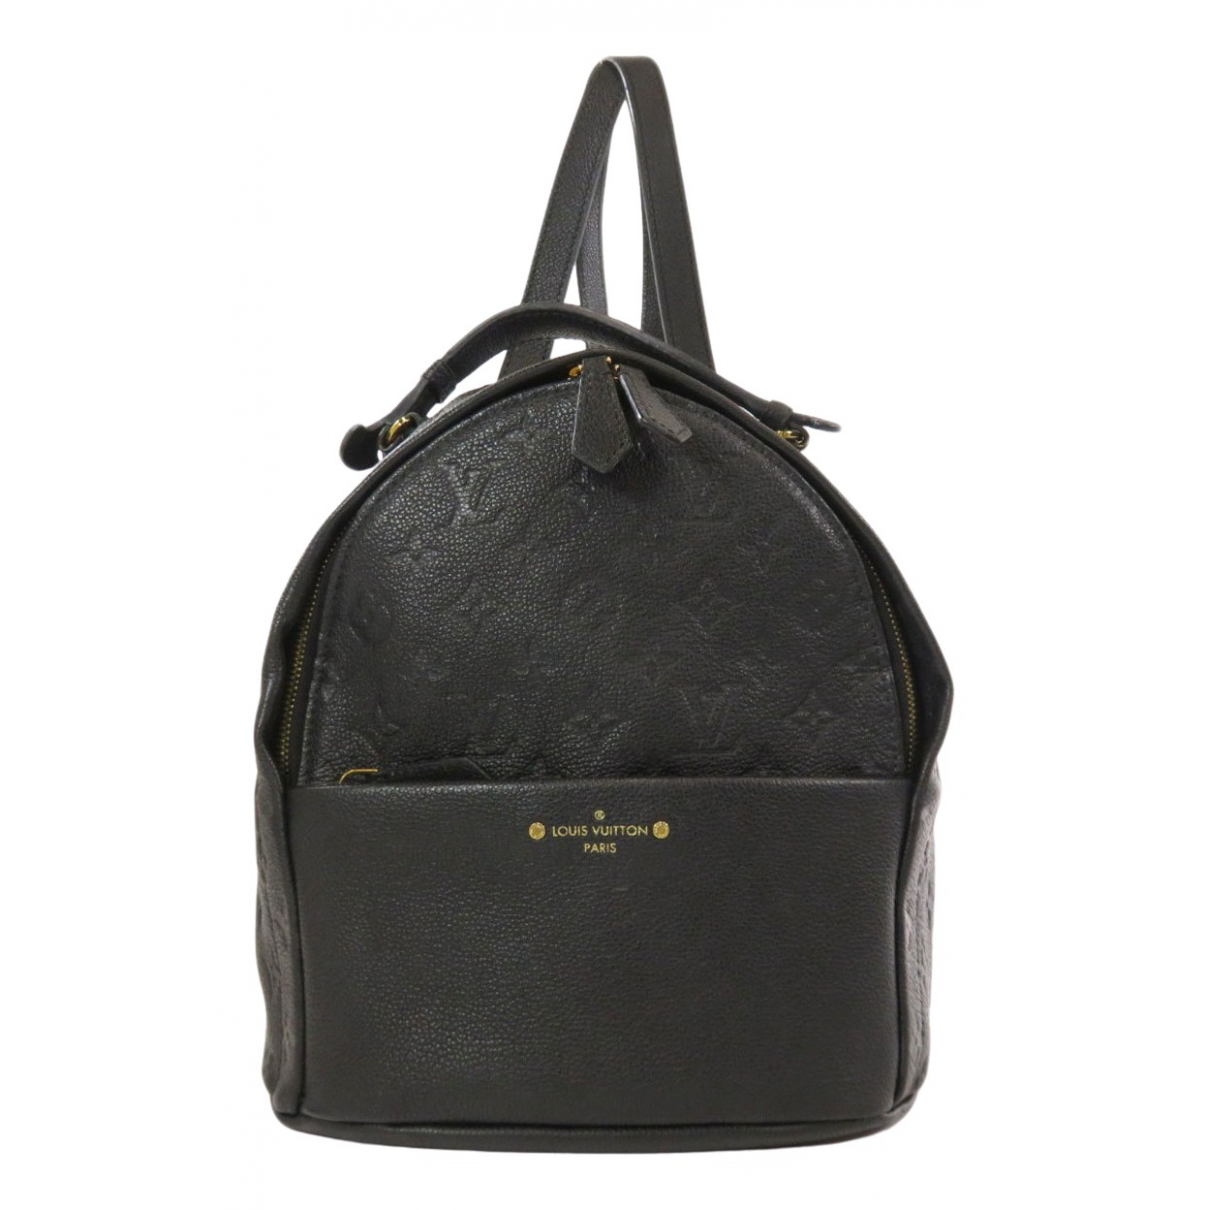 Louis Vuitton Sorbonne Backpack Rucksaecke in  Schwarz Leder